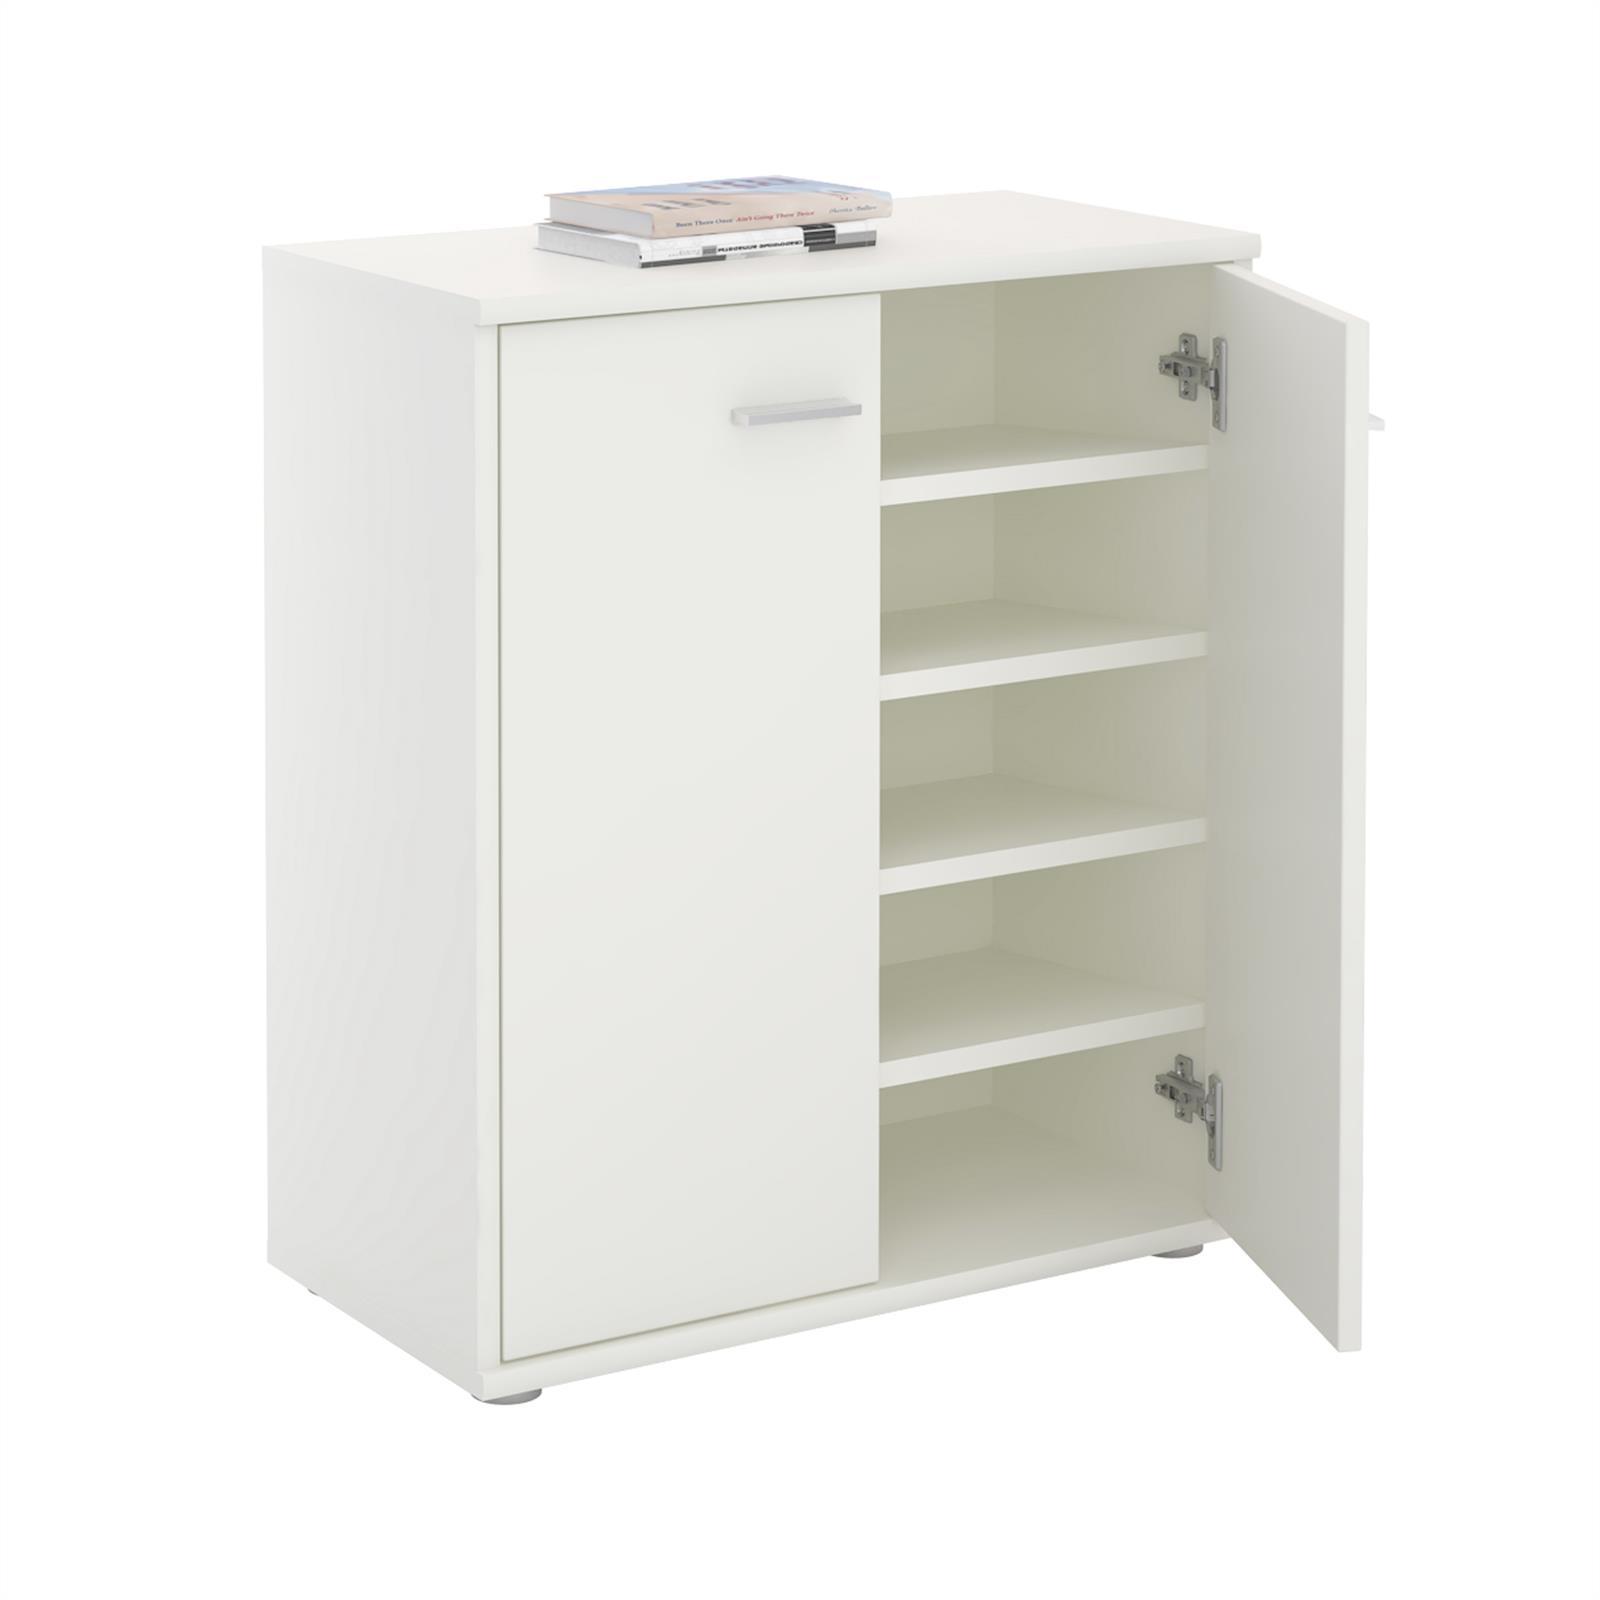 Ikea Schuhschrank Trones Ebay Ikea Tjusig Schuhregal Weiss Nazarm